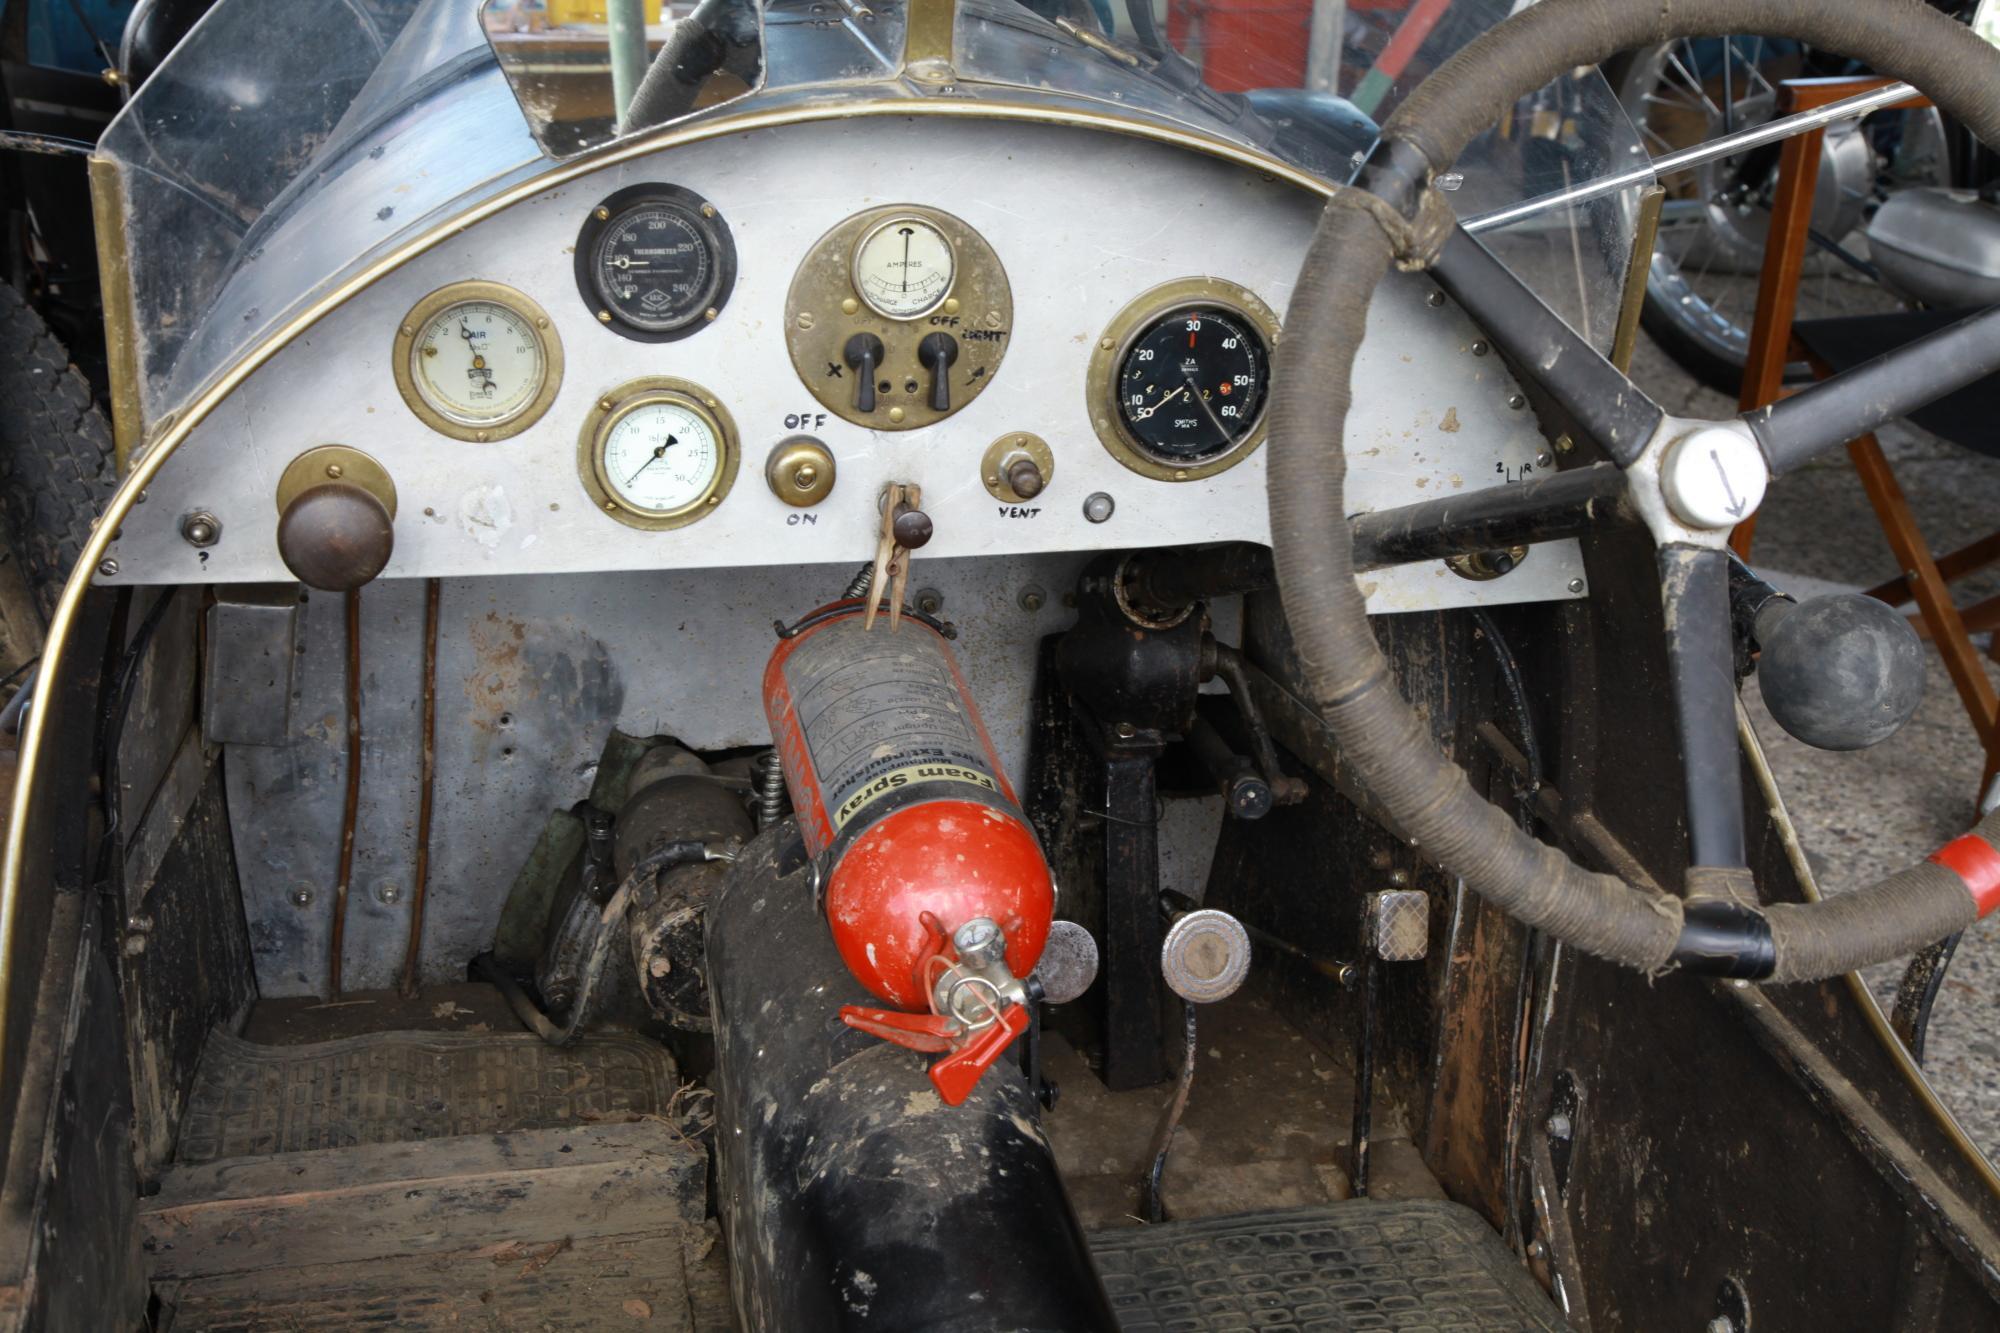 brazzeltag technikmuseum speyer